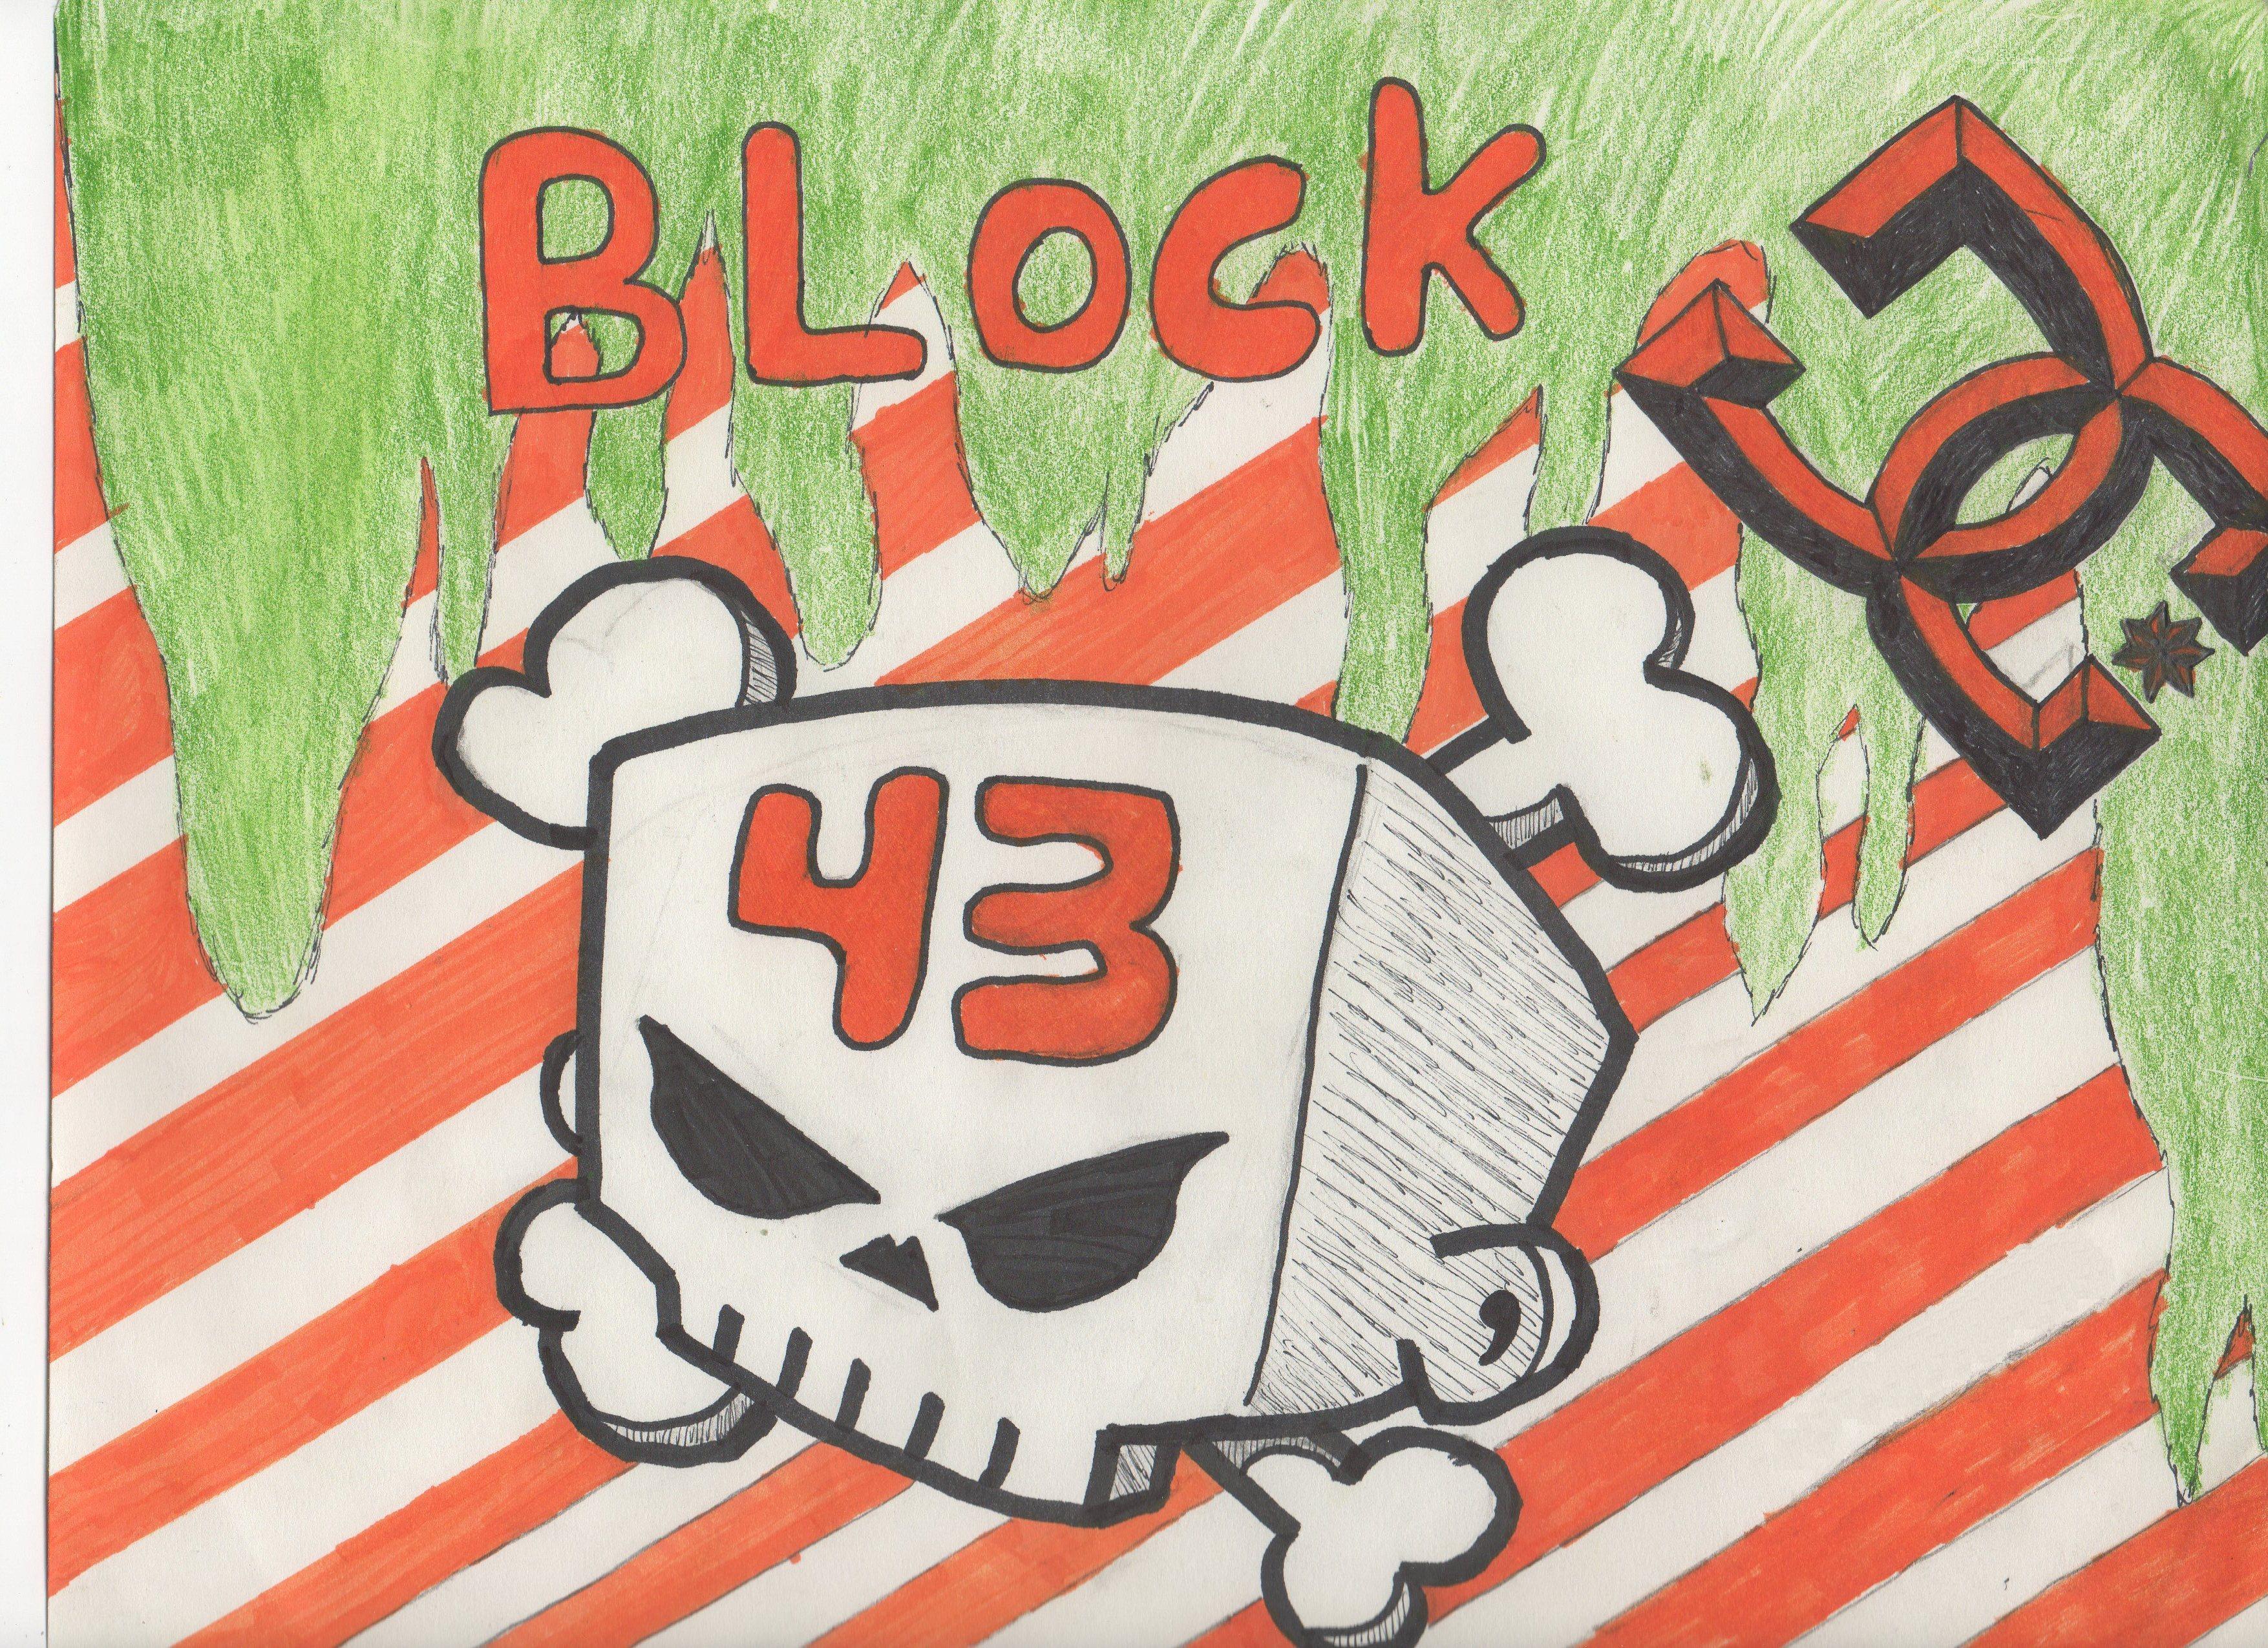 block_forty_three_skull_by_residentanarc